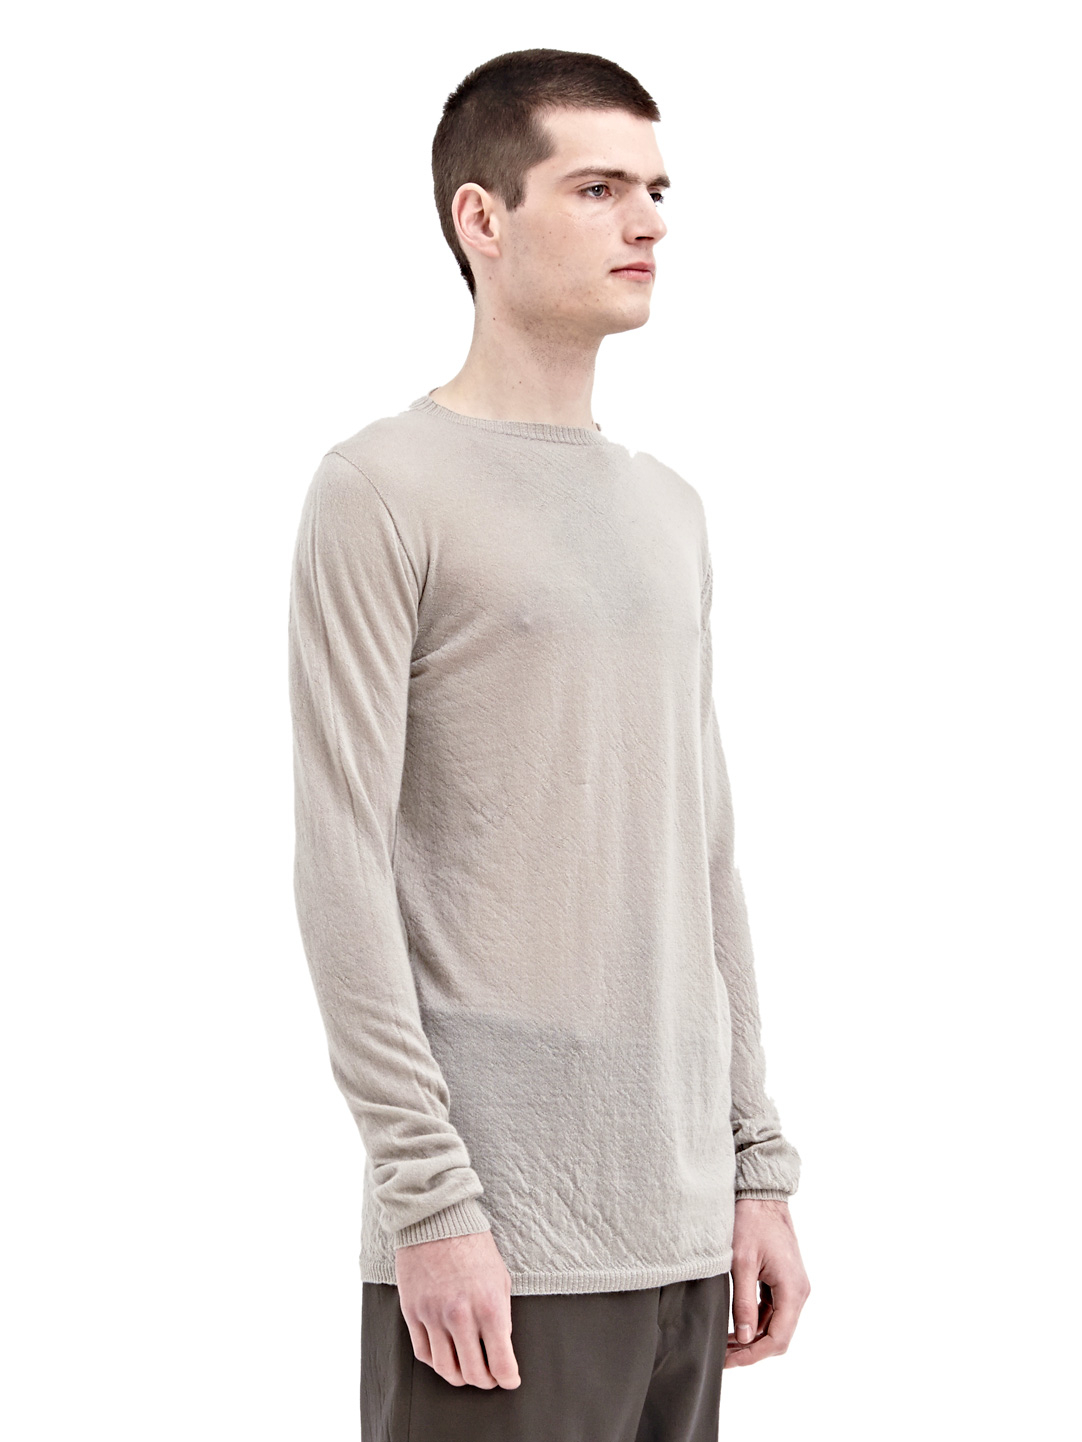 Rick Owens crew neck rib knit sweater Free Shipping Popular Cheap Sale Enjoy UfxZ0RF